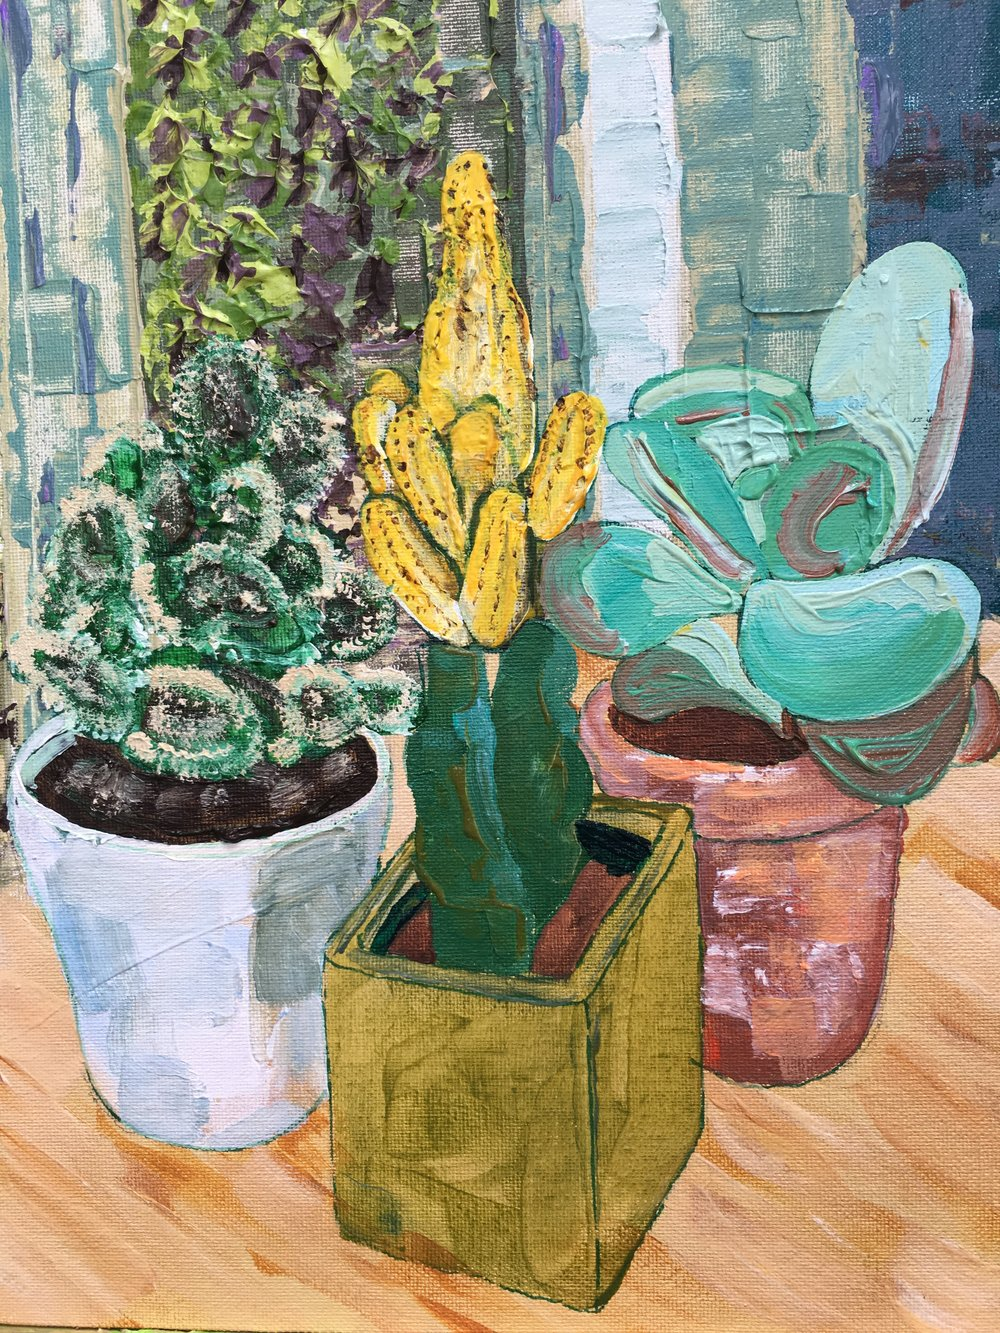 Succulents 2017, acrylic on board, 30x25cm (image), 38x32.5cm (framed). £450